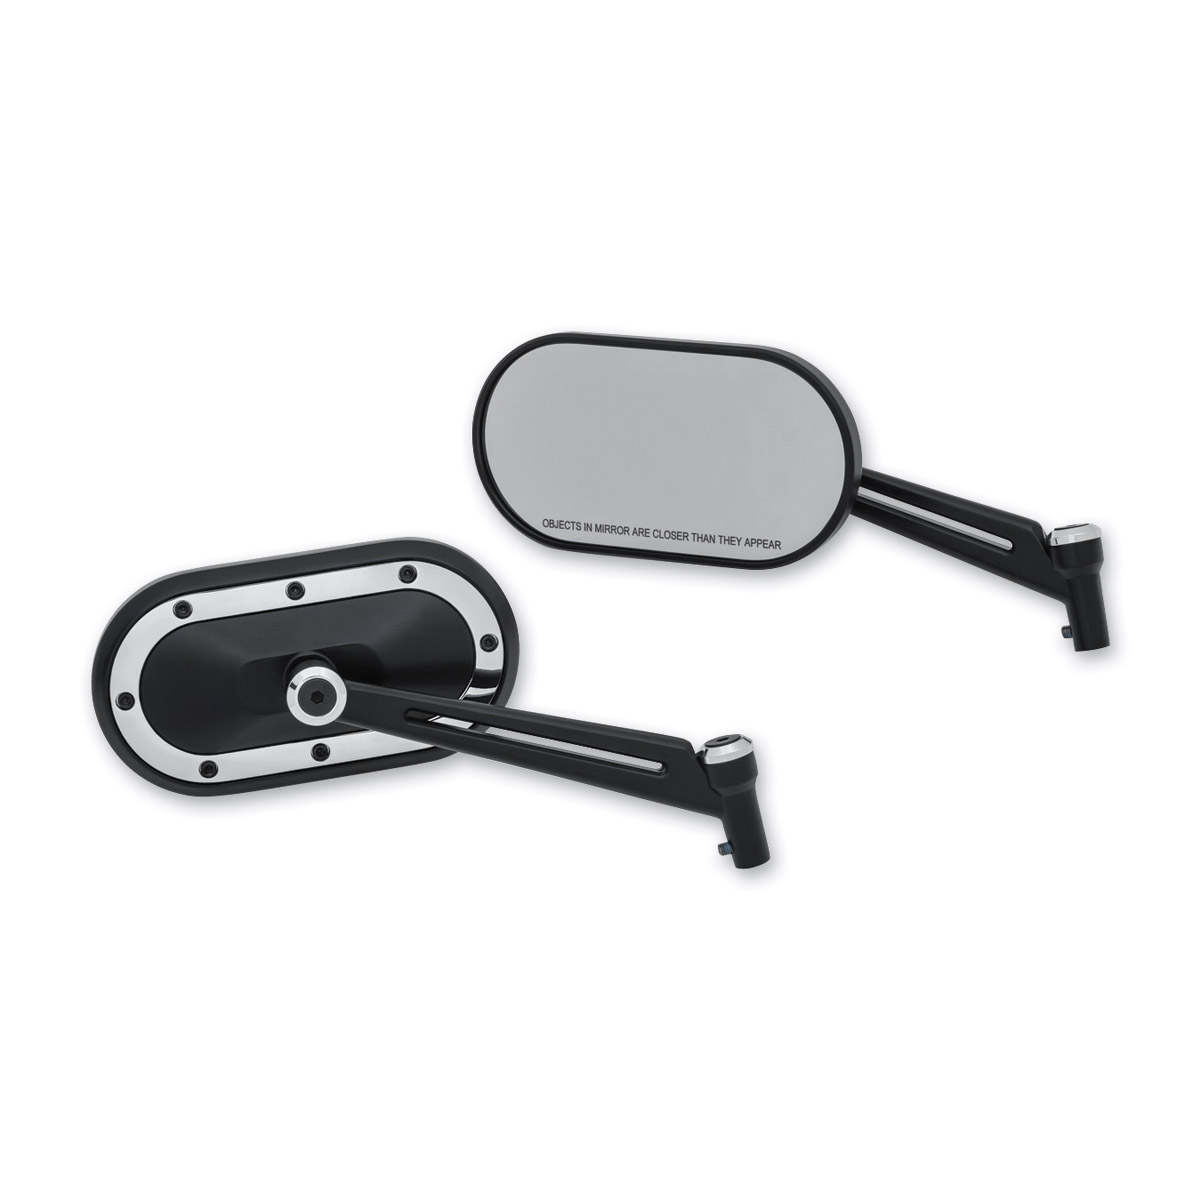 Kuryakyn Heavy Industry Black Mirror with Chrome Accents